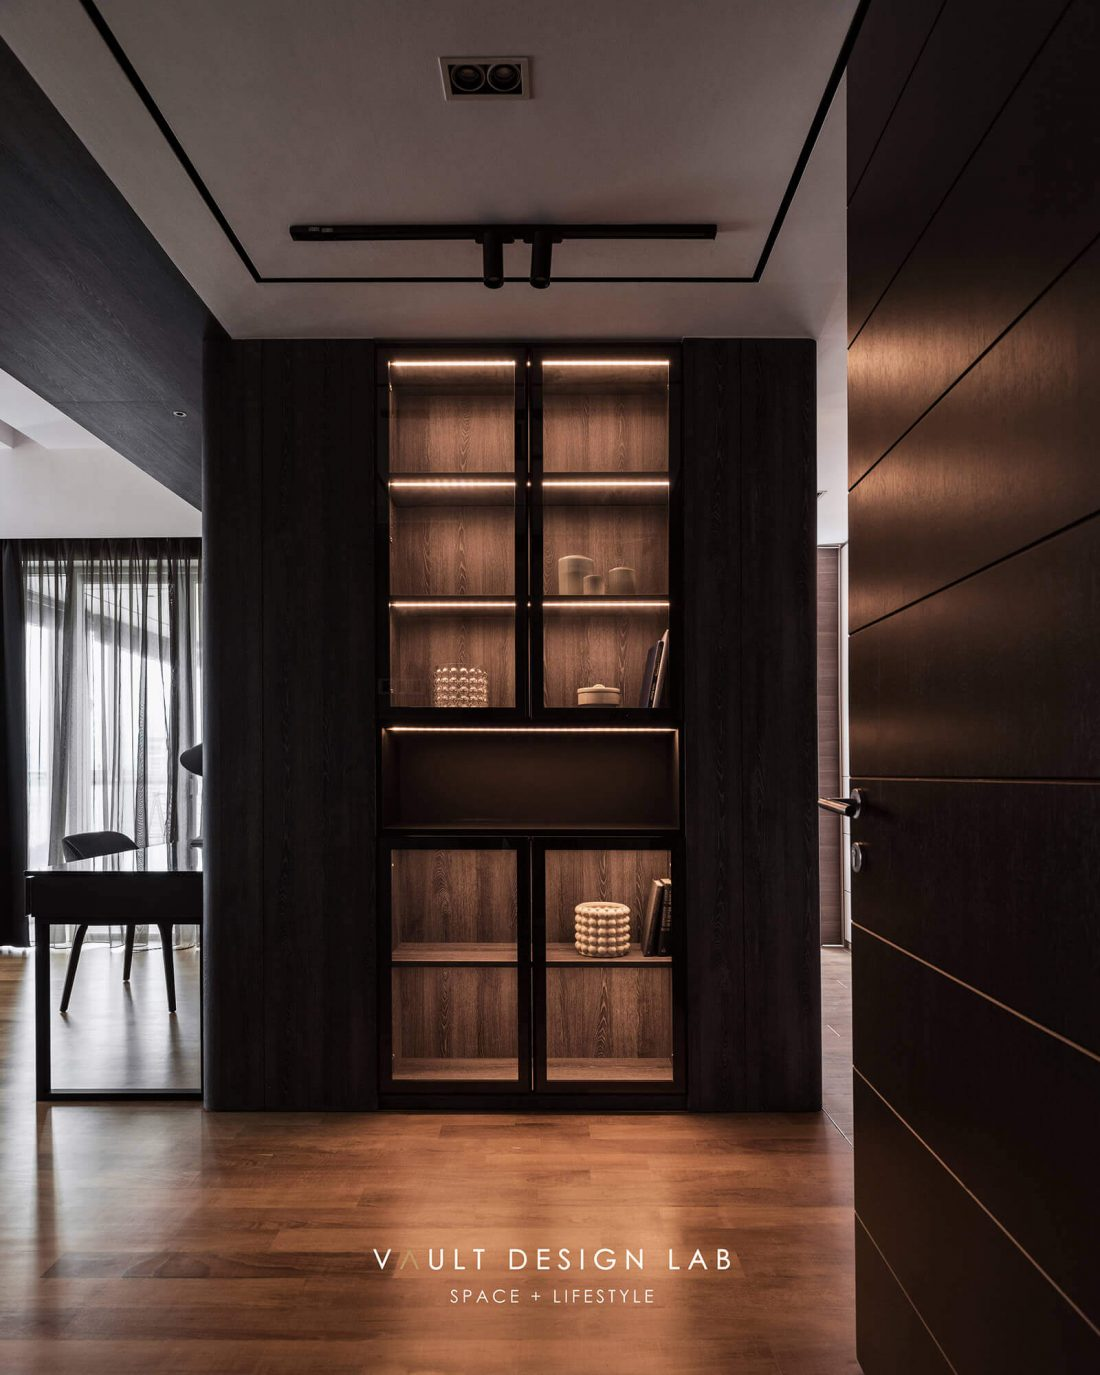 Interior-Design-One-Tanjong-Tanjung-Bungah-Penang-Malaysia-Master-Bedroom-Design-v1